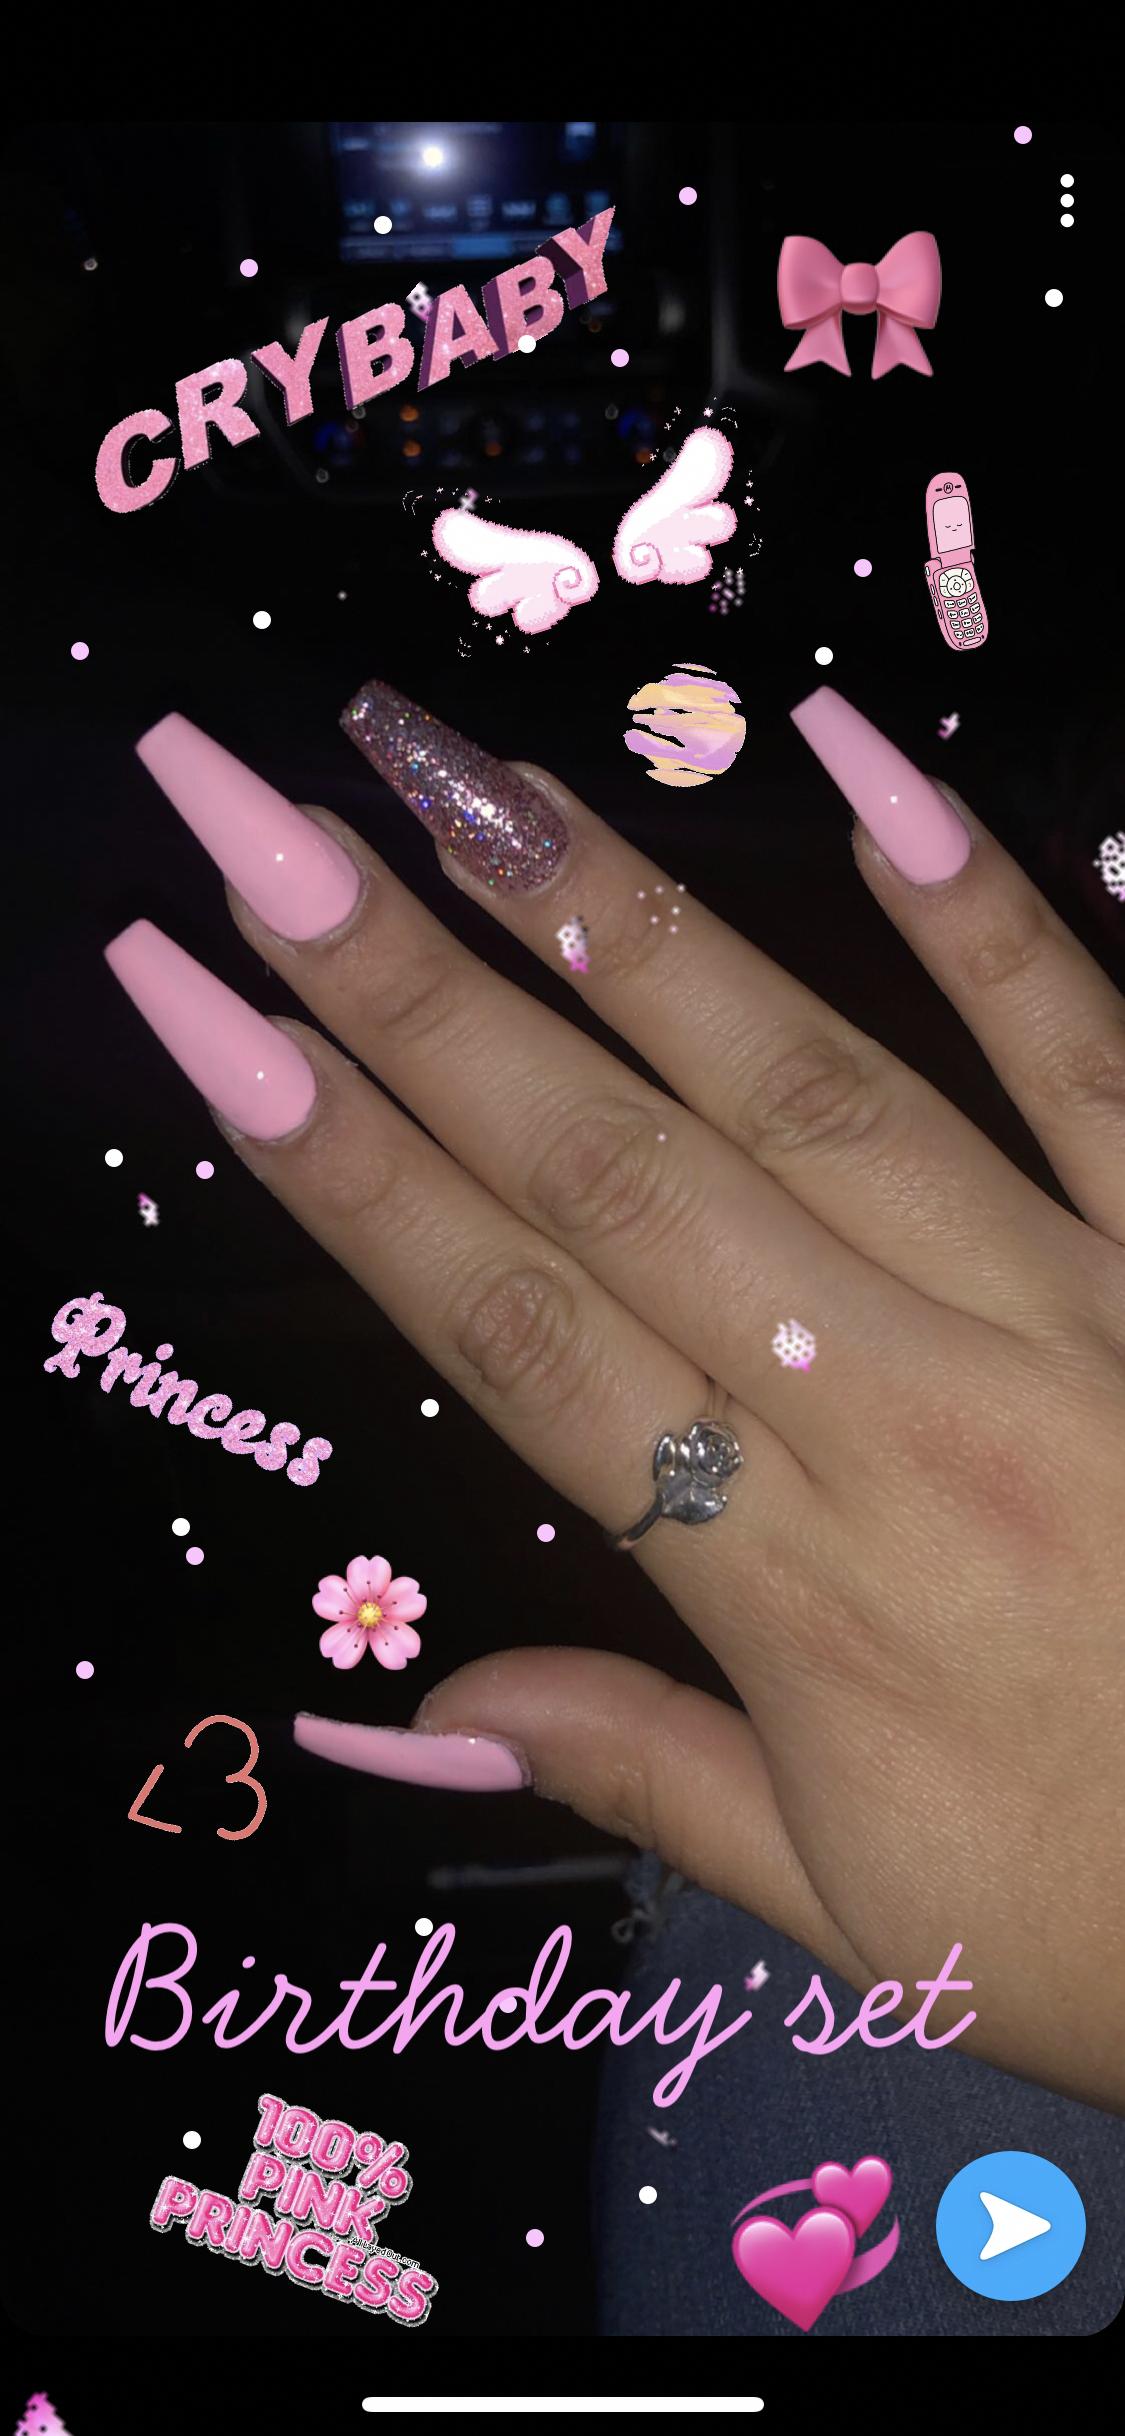 My 18th Birthday Set Pink Acrylic Nails Glitter Coffin Baddie Nailart Nailinspiratio Acrylic Nails Coffin Pink Pink Acrylic Nails Best Acrylic Nails